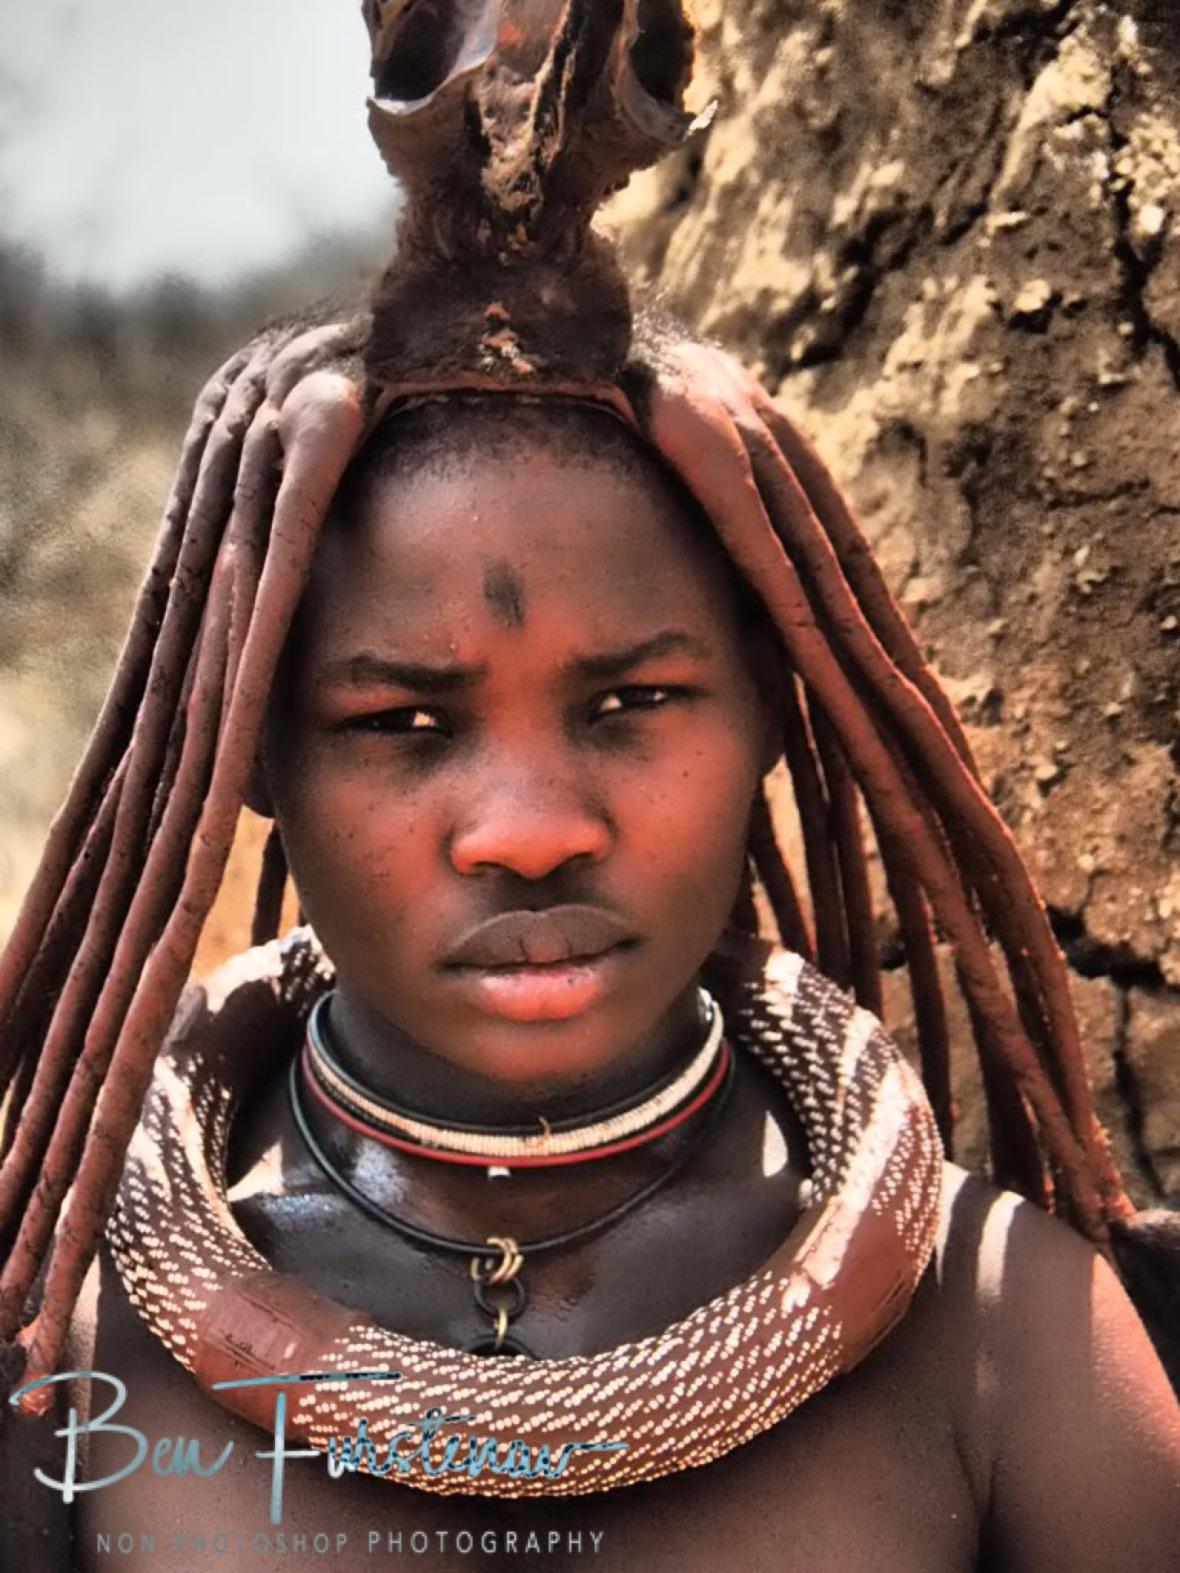 A very serious look, Omusaona Himba Village, Kamanjab, Namibia